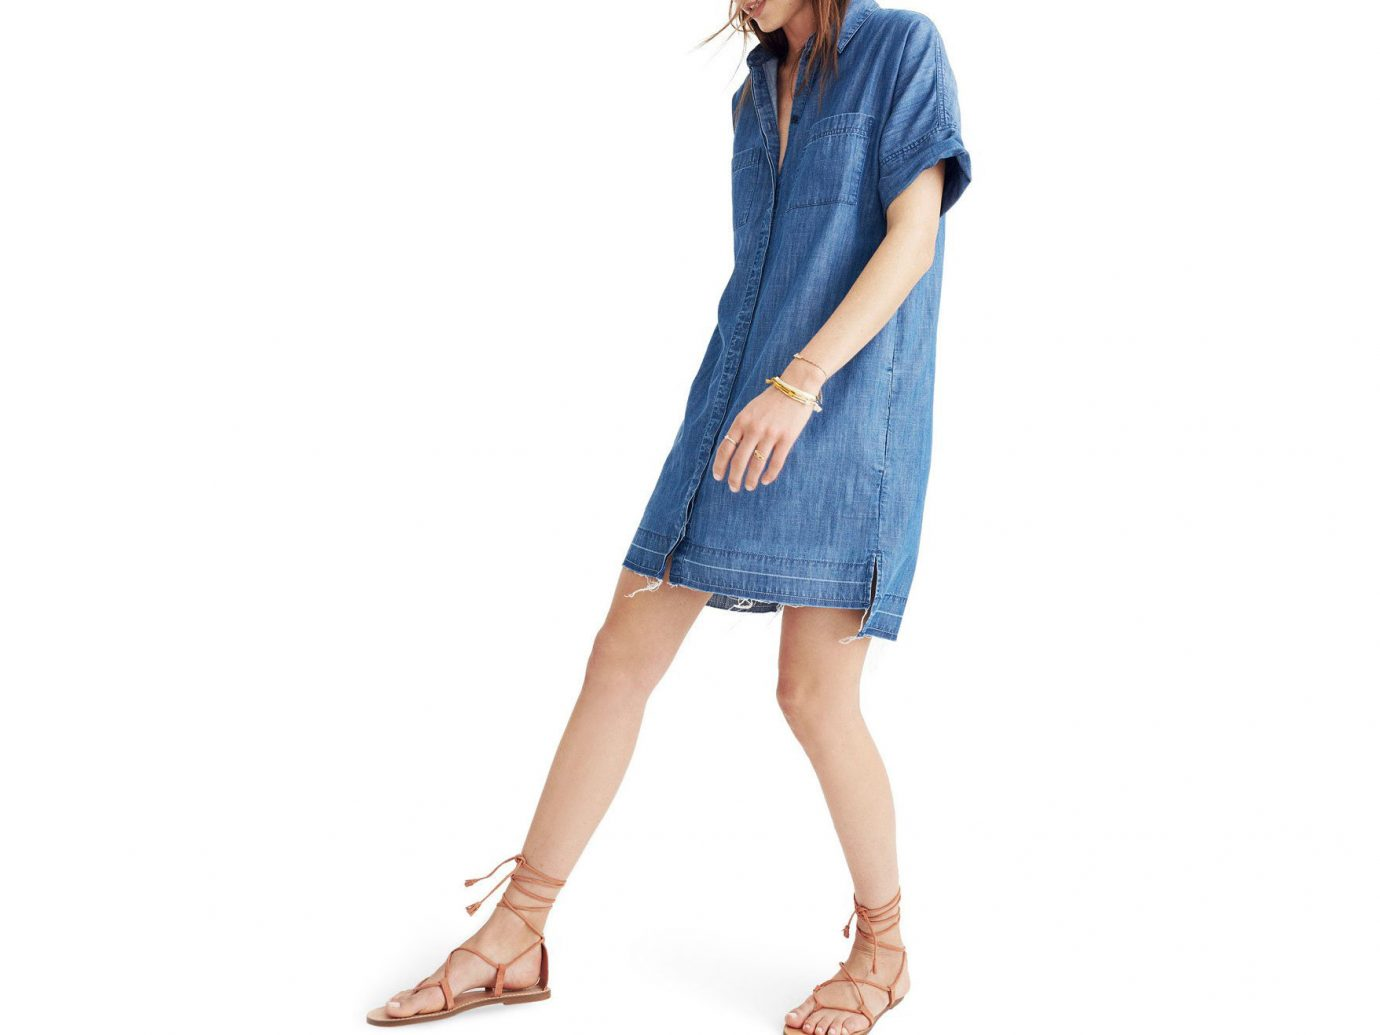 Cruise Travel Style + Design person clothing denim sleeve dress jeans pattern posing outerwear textile gown blue photo shoot t shirt Design neck pocket abdomen